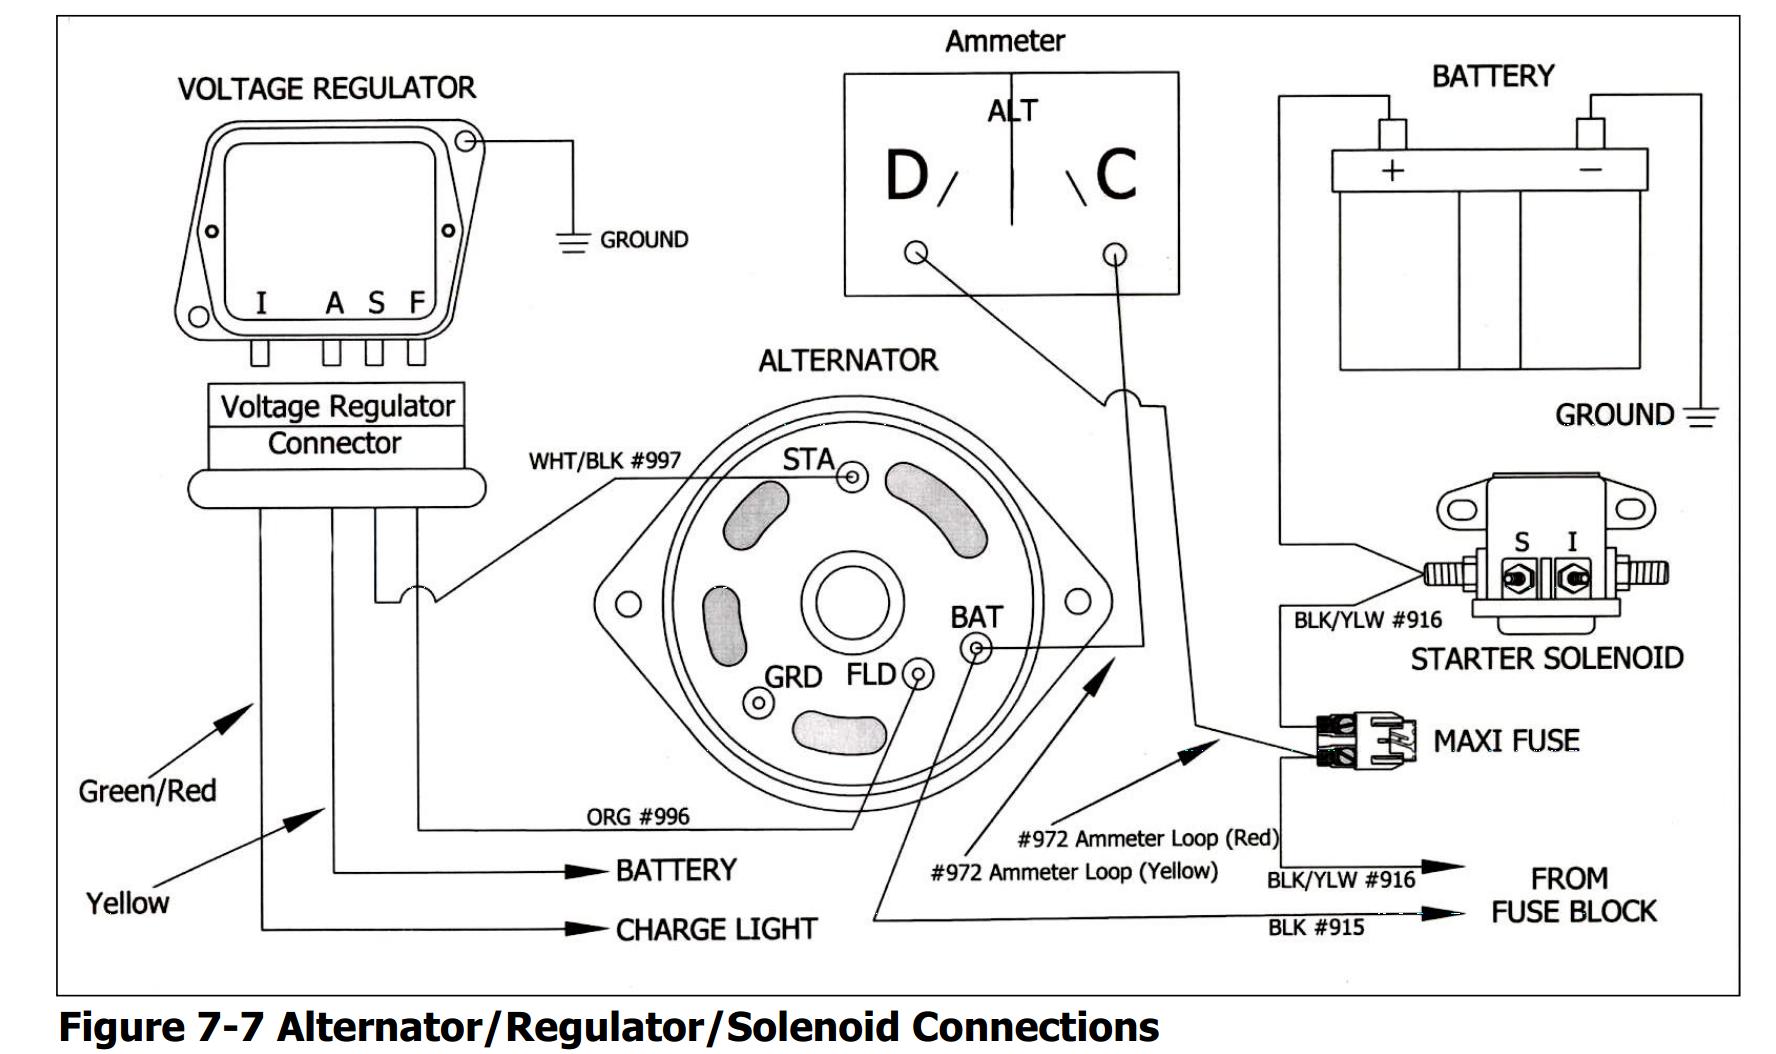 medium resolution of vr600 voltage regulator wiring diagram wiring libraryski doo voltage regulator diagram basic guide wiring diagram